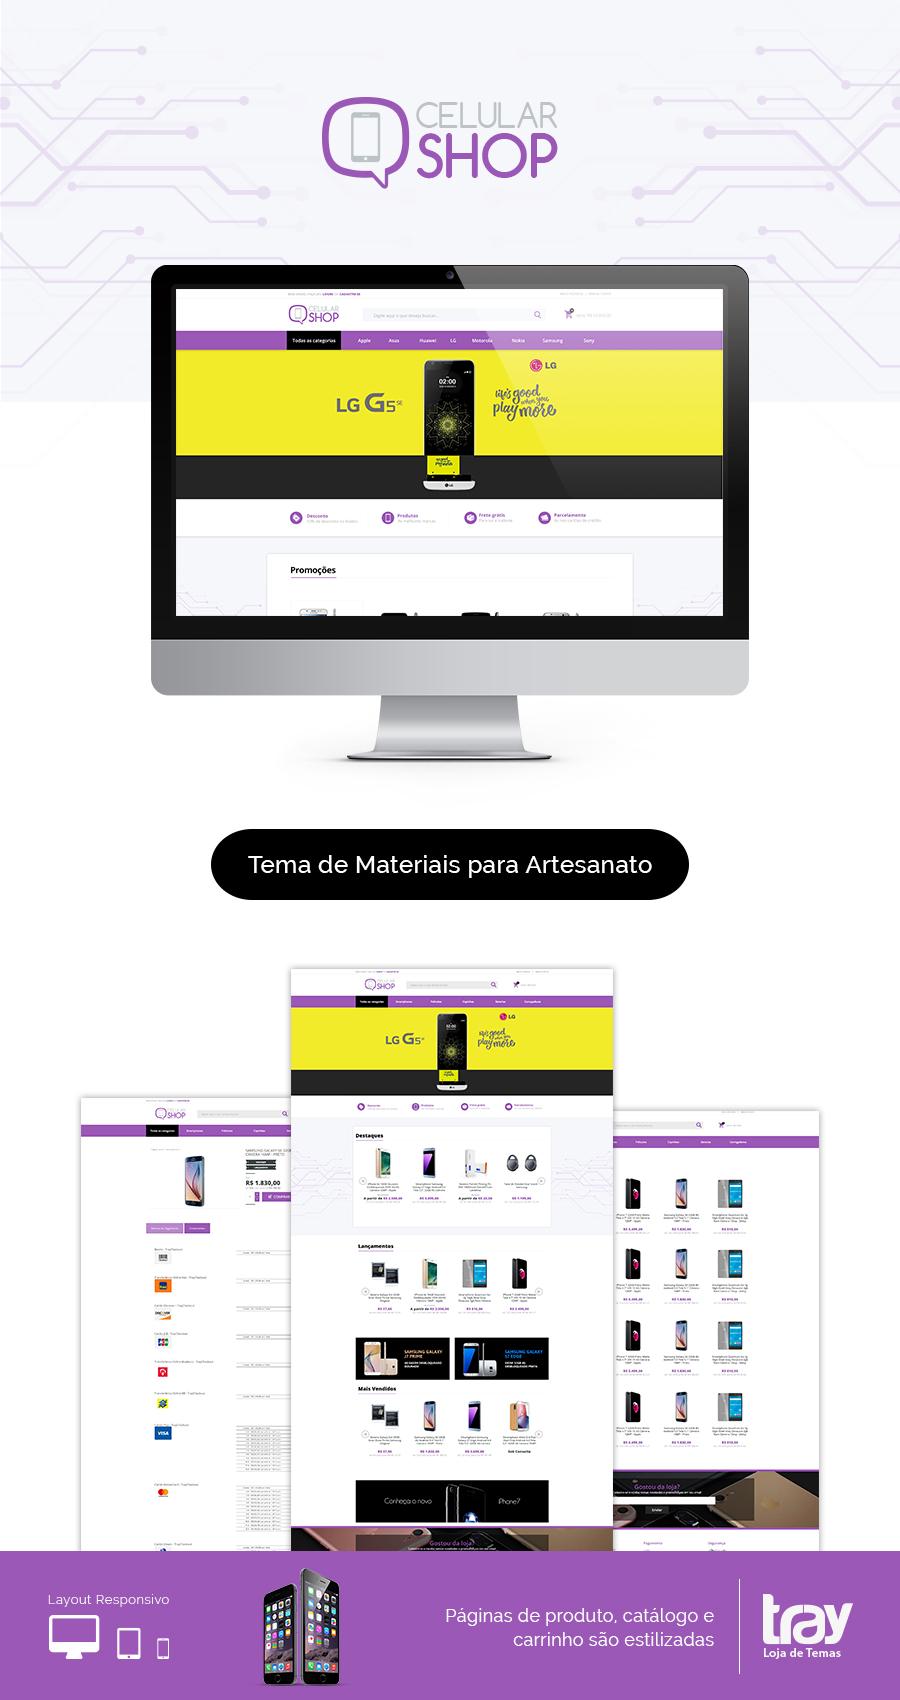 celular shop